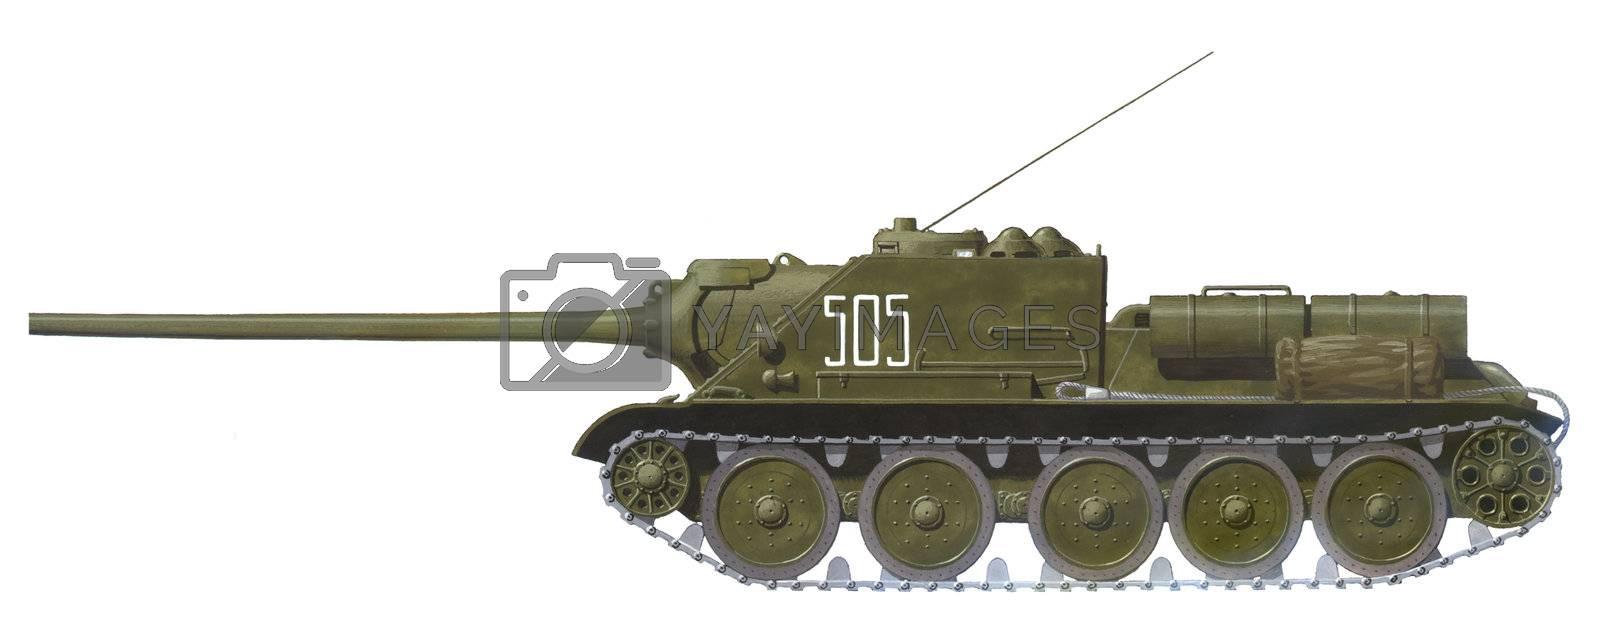 SU-100 tank destroyer by martinspurny